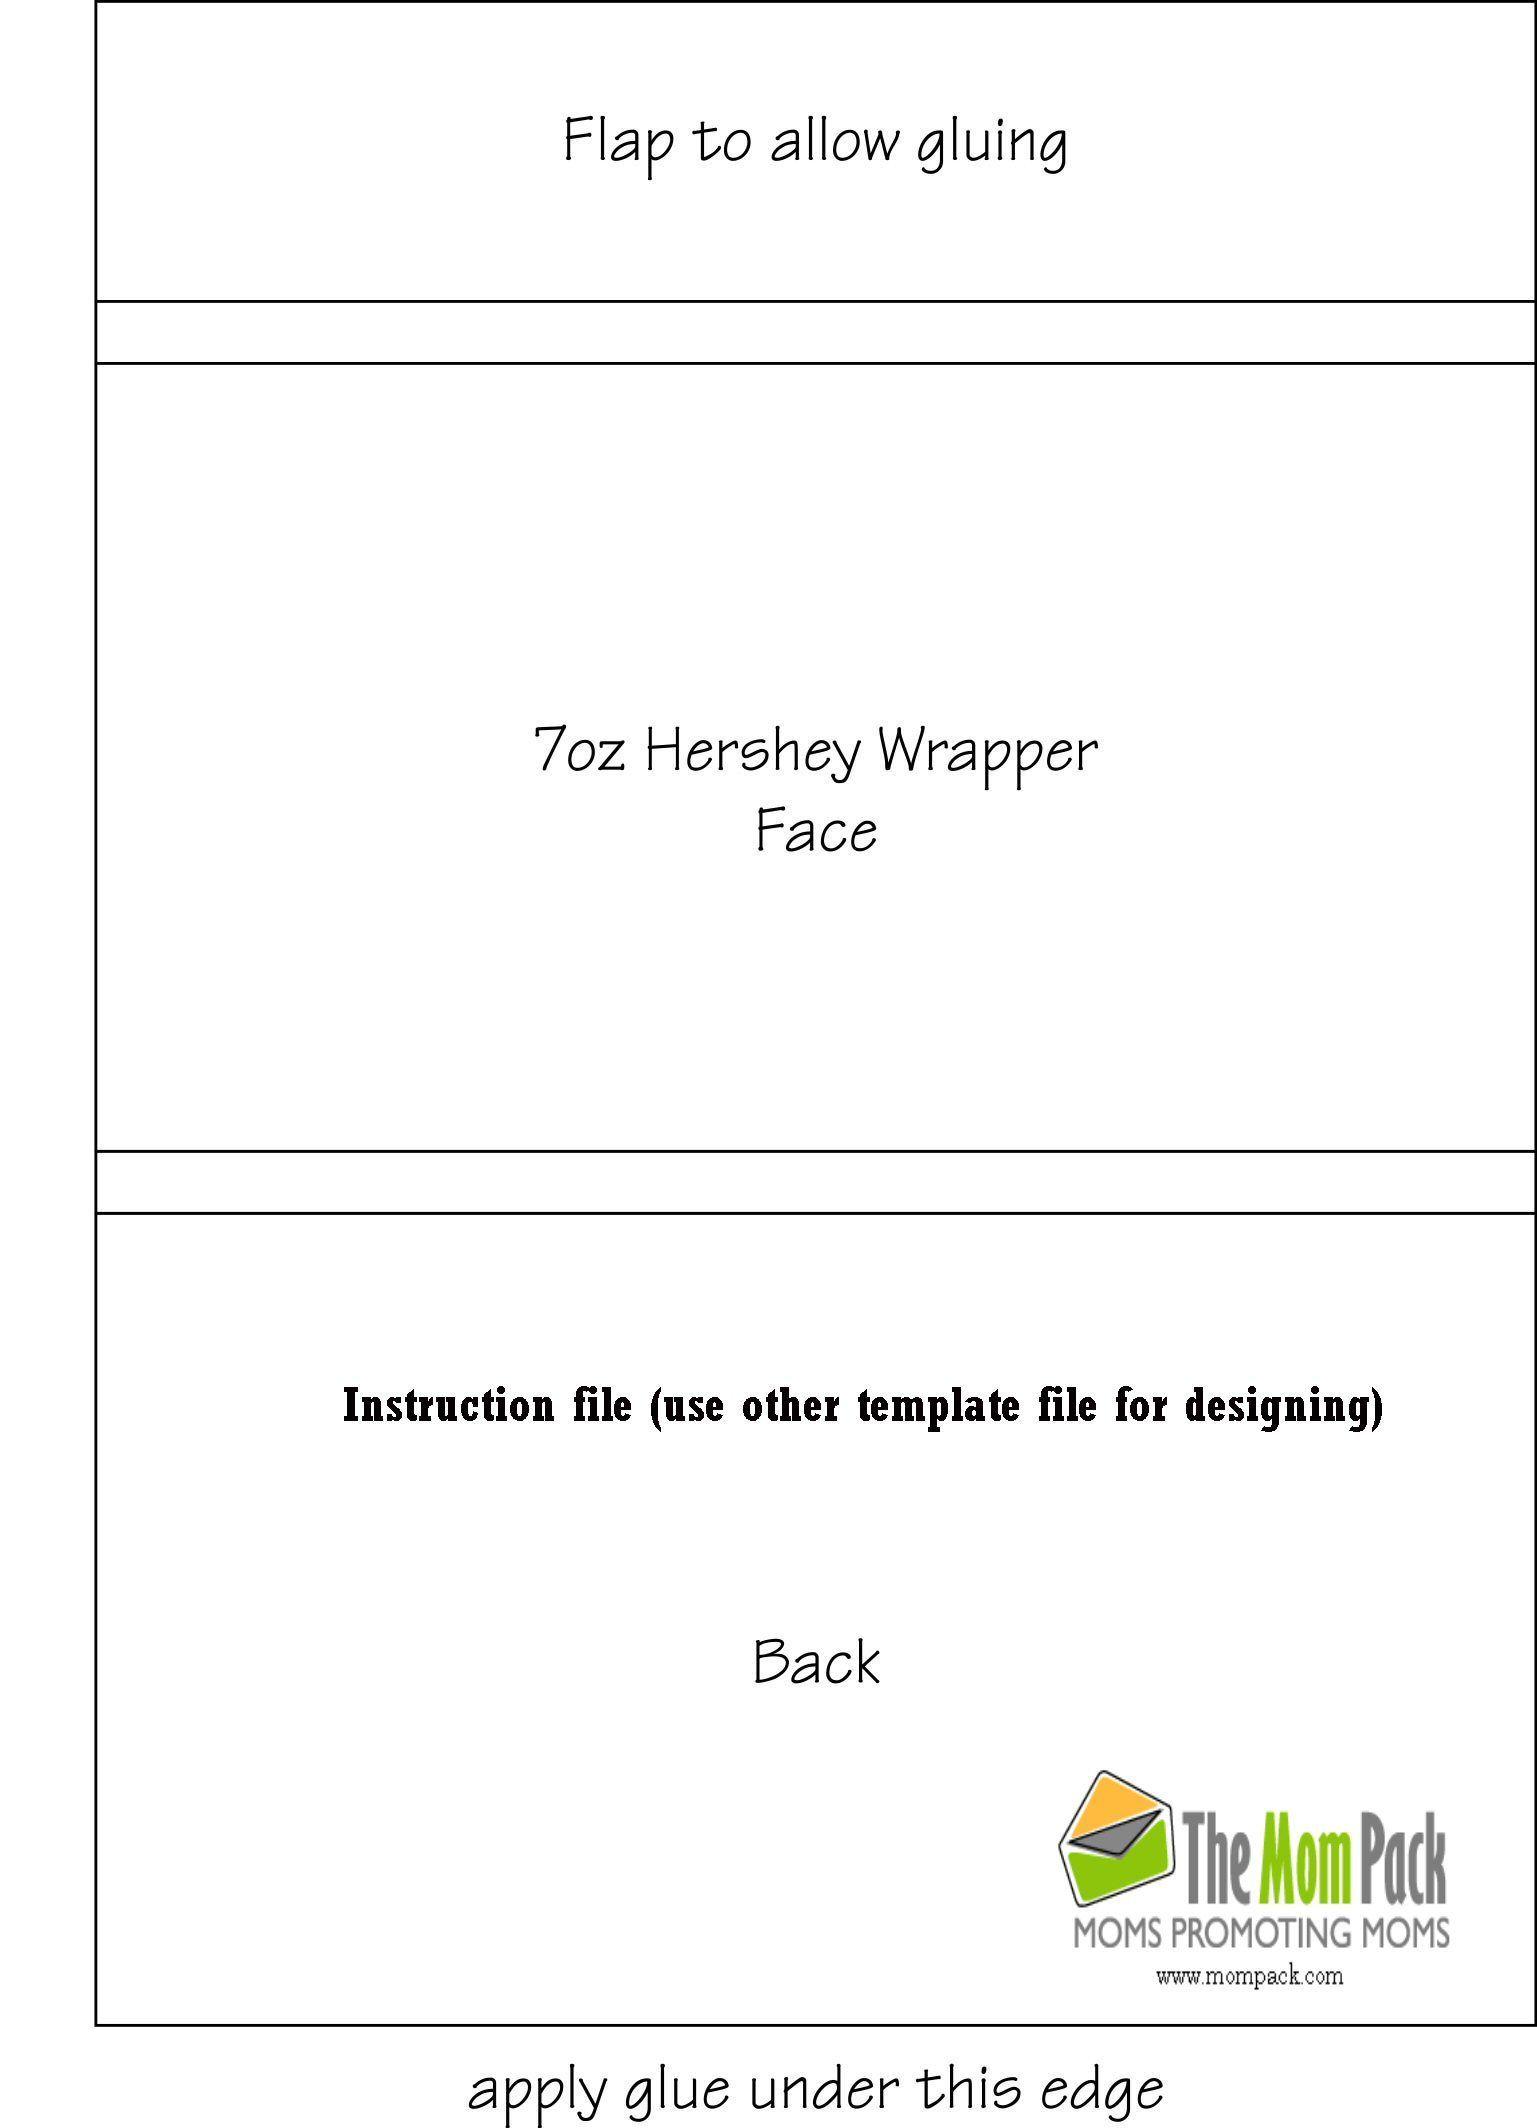 005 Hershey Bar Wrapper Template Ideas Magnificent Free Regarding